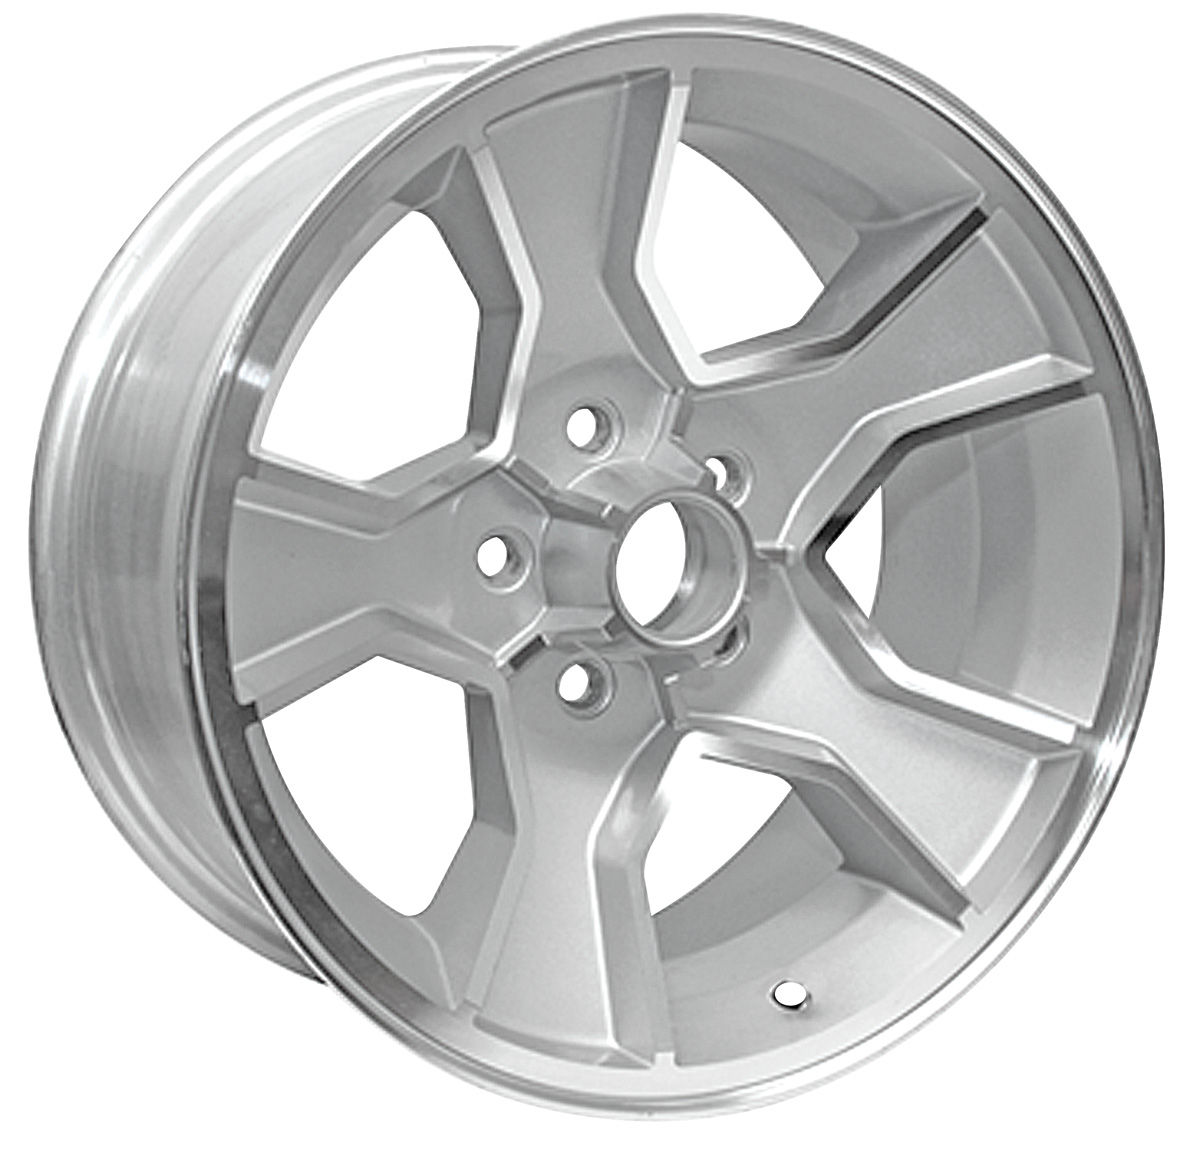 "N90 Wheel, 1986-88 Monte Carlo, Silver 17x8, 4.25""BS"